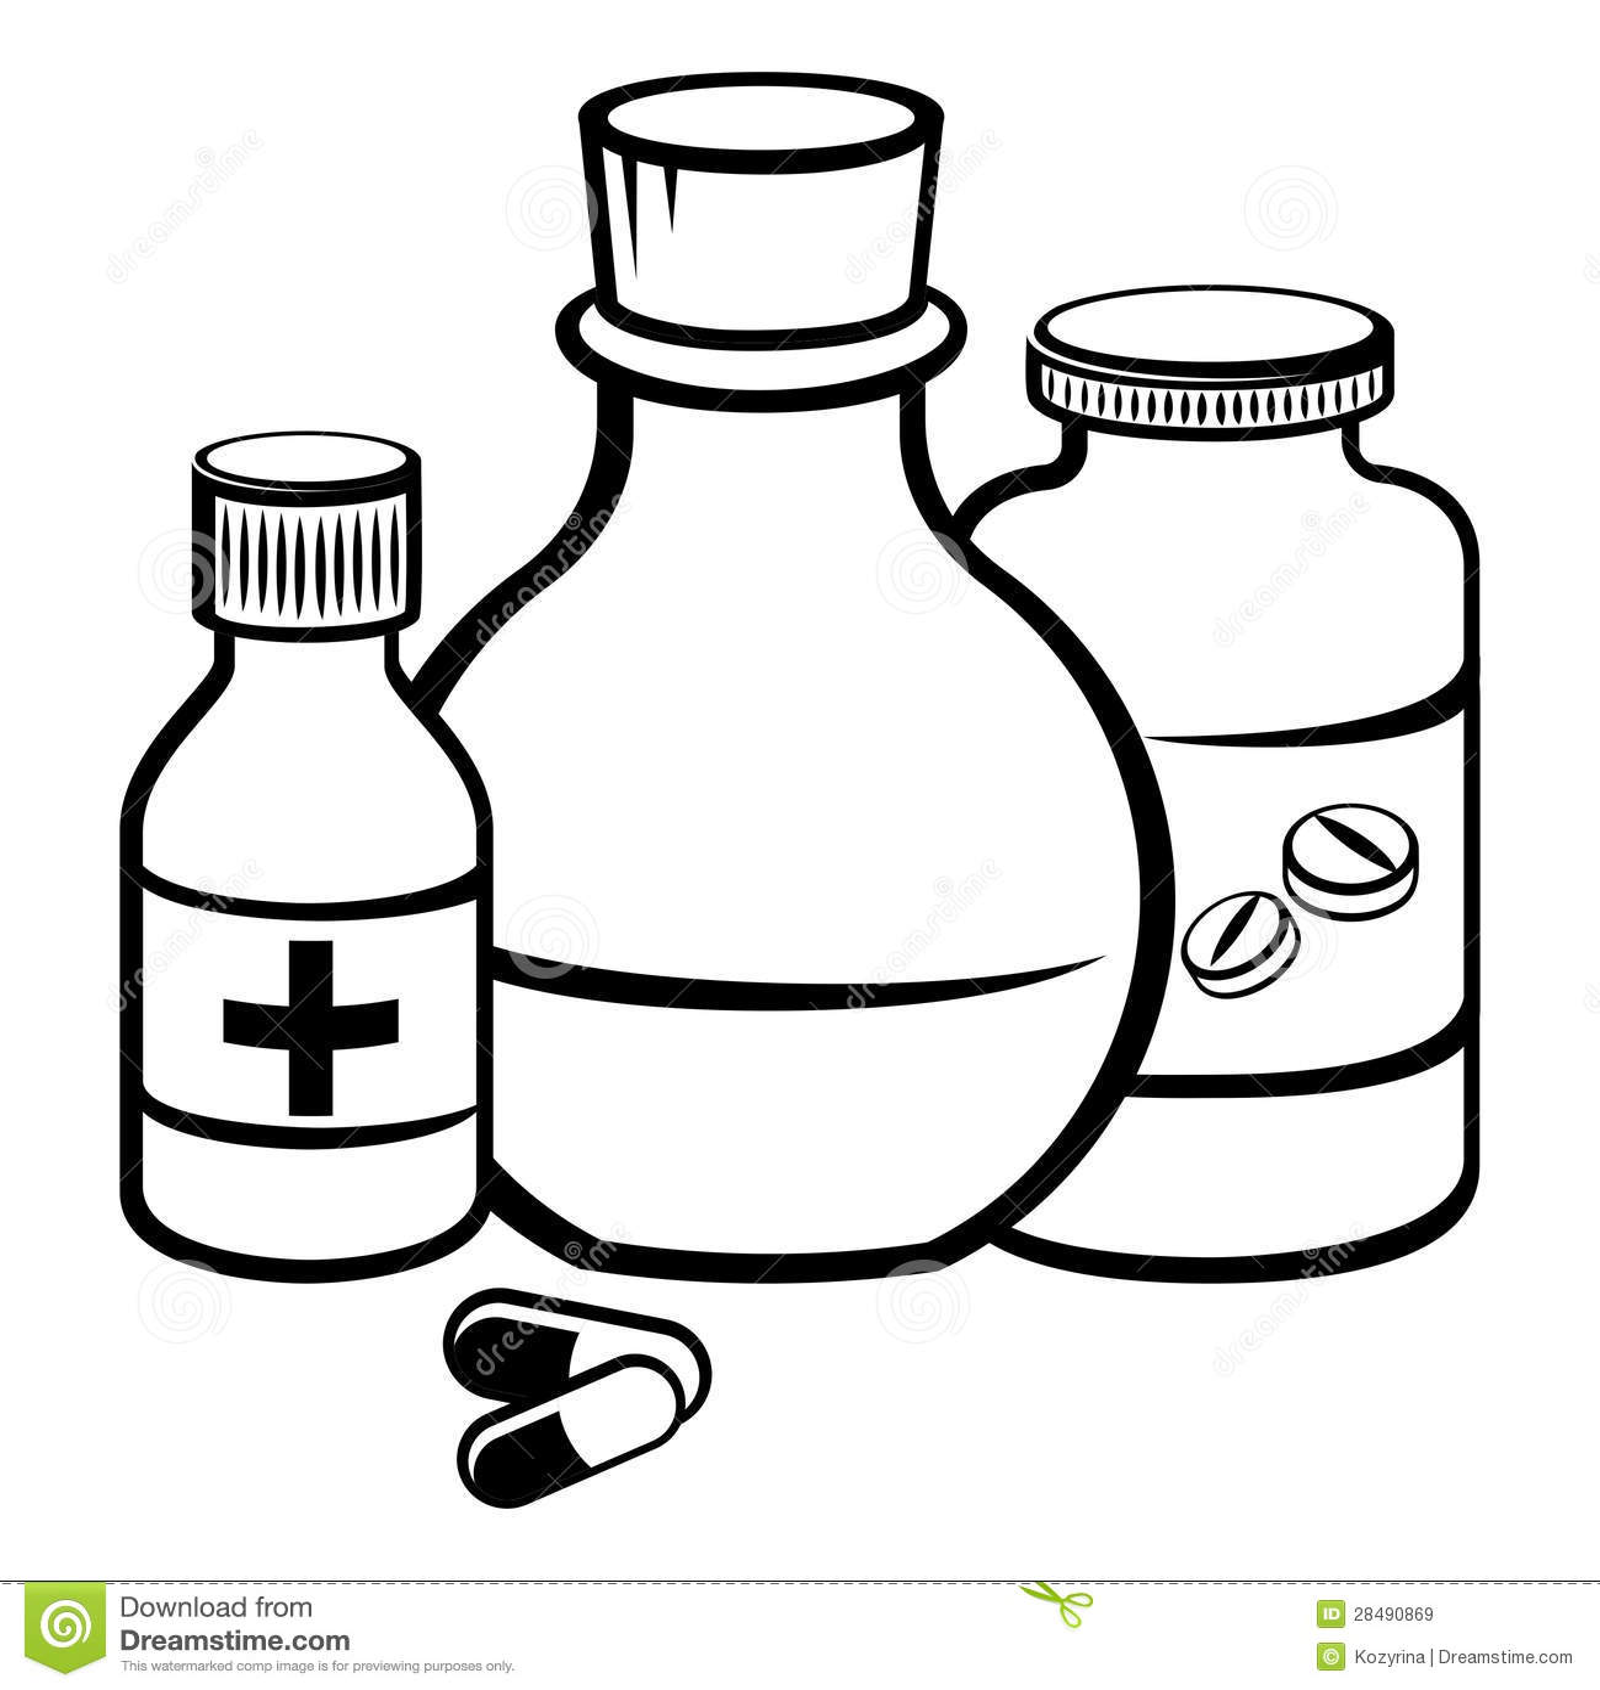 Medicine: Medicine Bottles Stock Vector. Image Of Capsule, Help